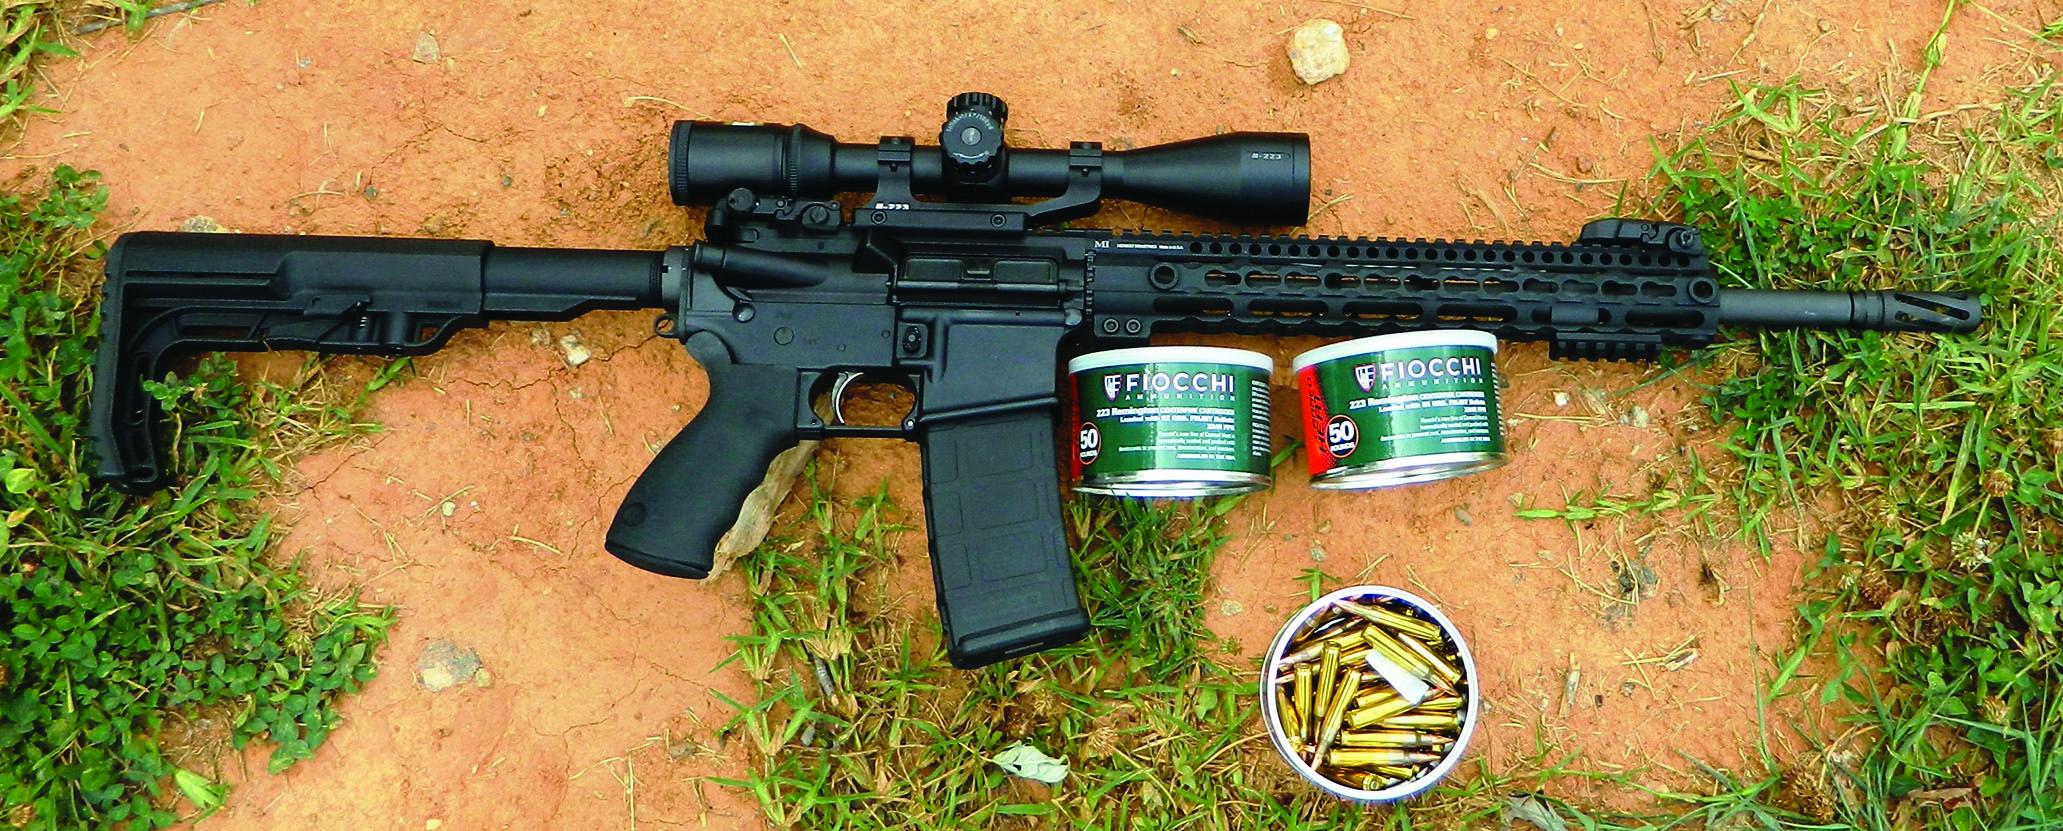 ammunition choices for 223 remington